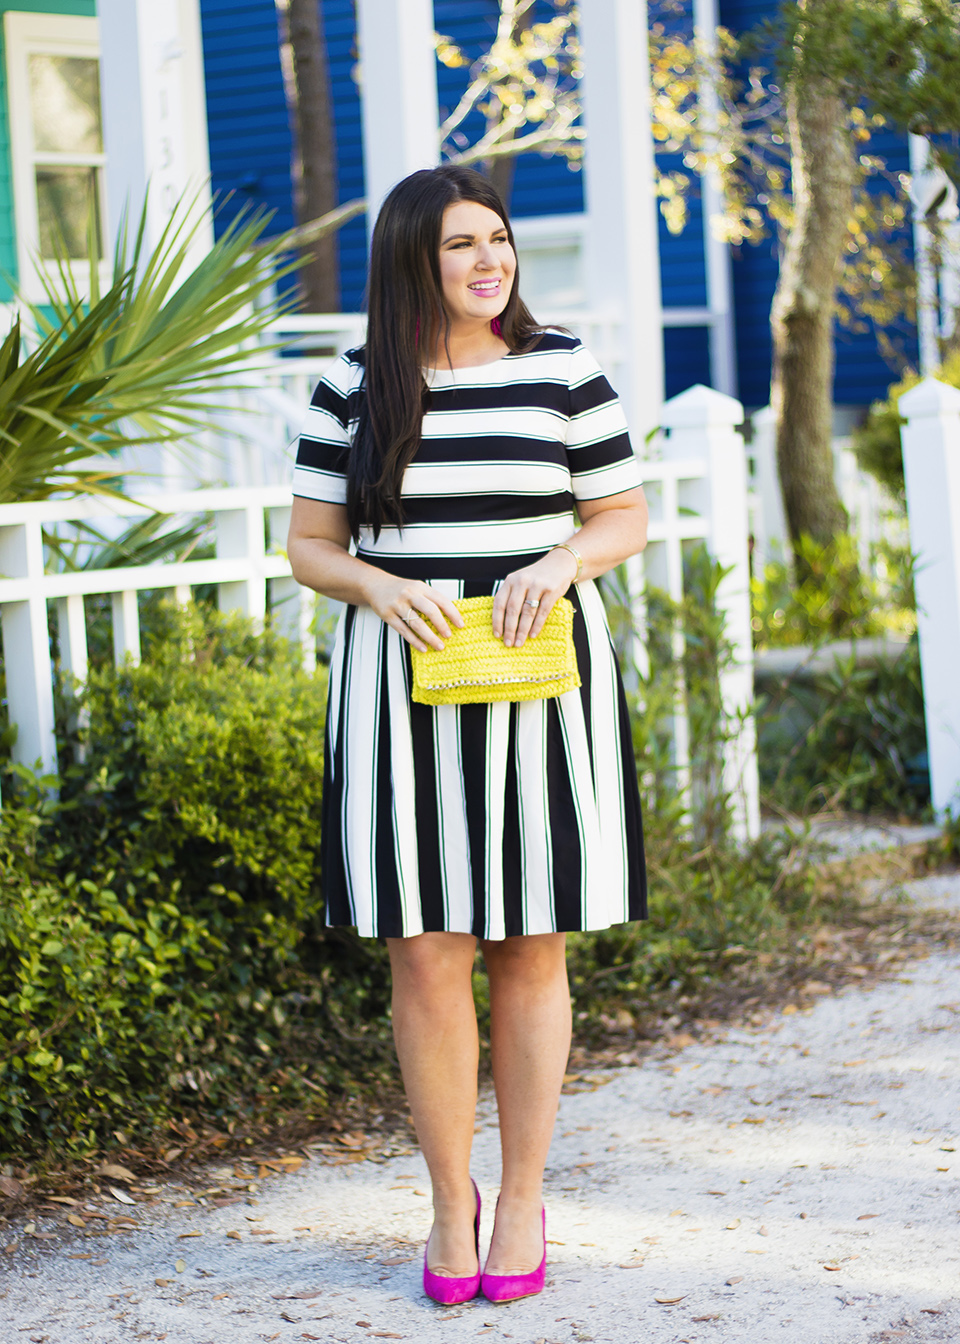 BW Ladylike Stripes 30A Street Style 5